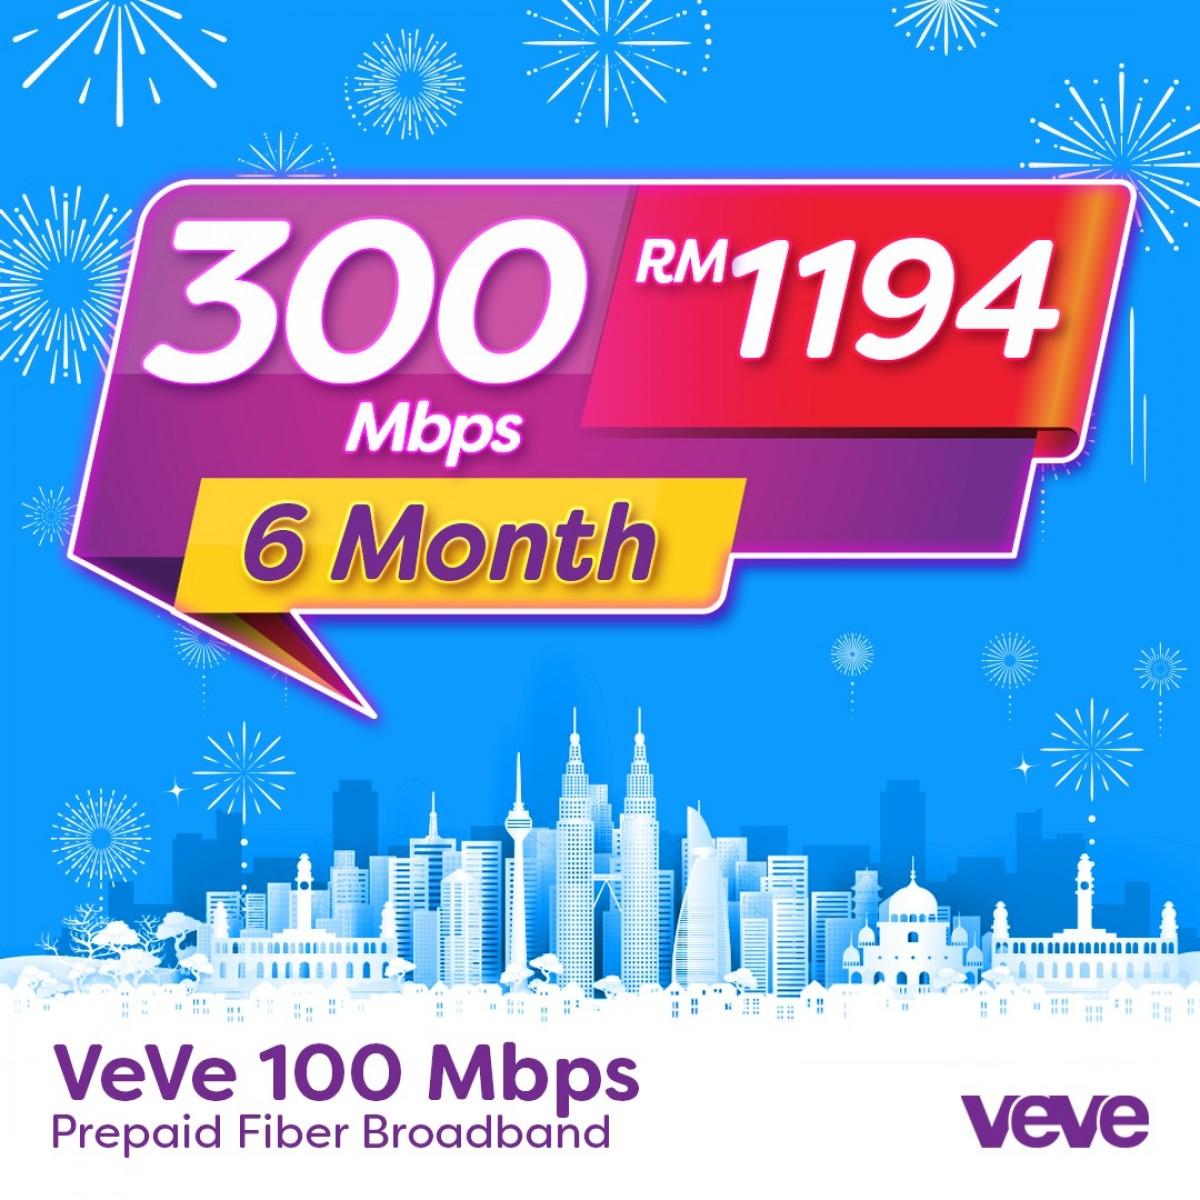 VEVE 300 Mbps Home Fibre (6 Months) - VEVE